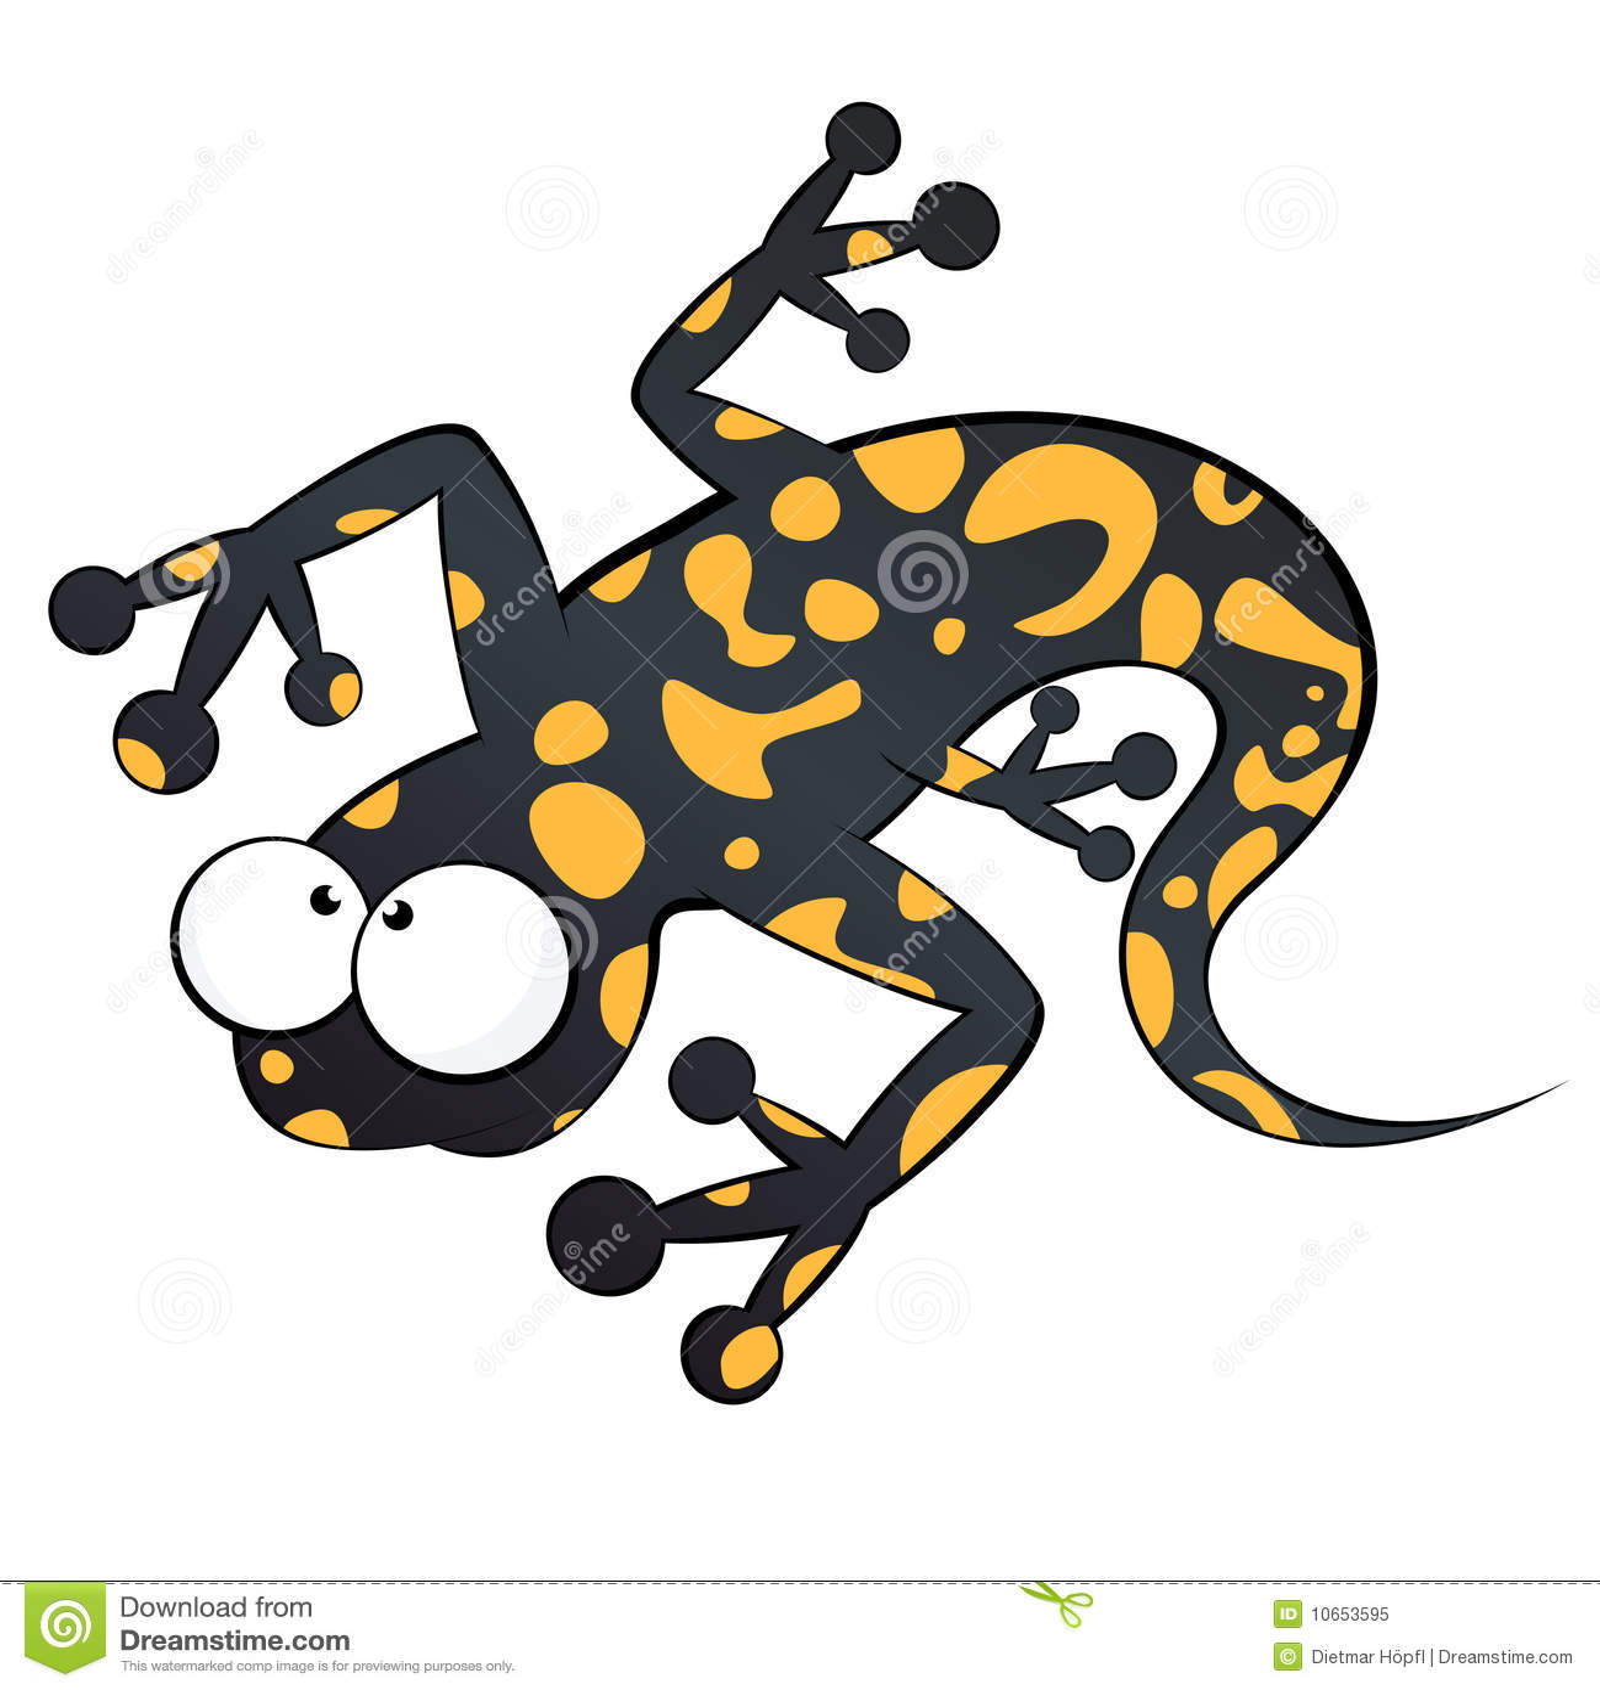 Funny cartoon lizard stock vector. Illustration of goggle - 10653595